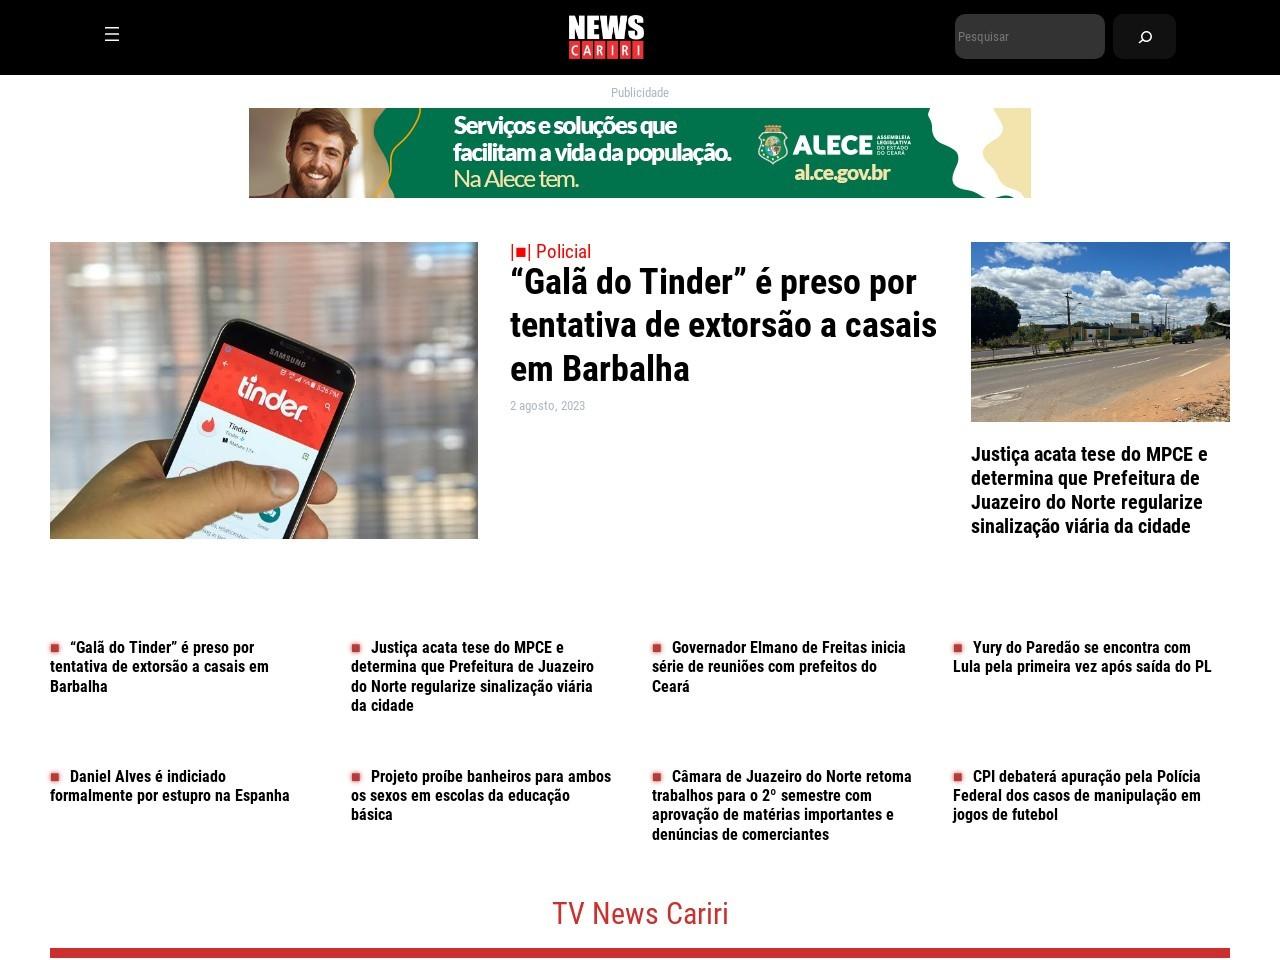 http://www.newscariri.com.br